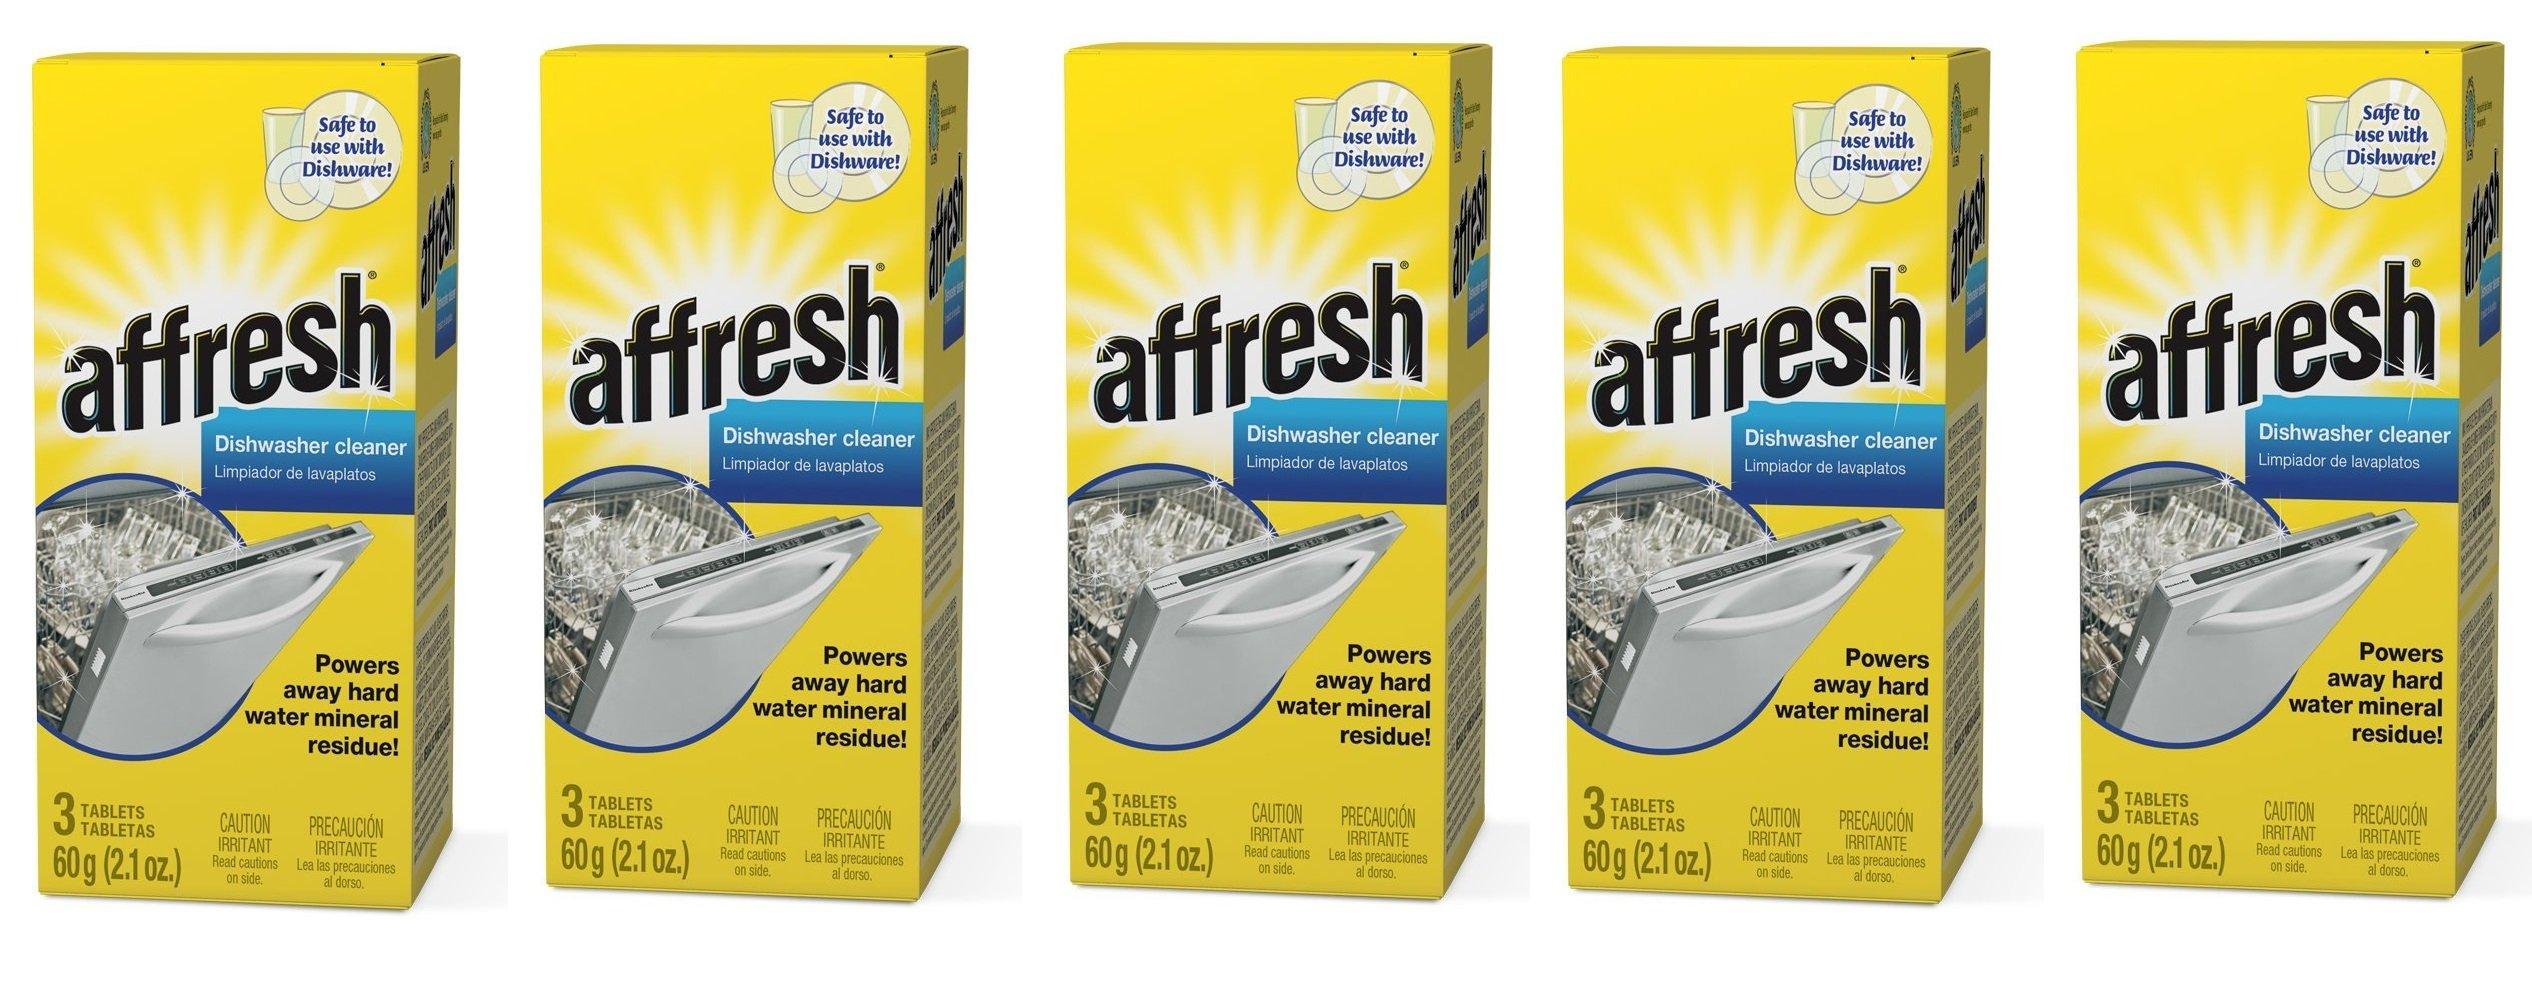 Affresh W10549850 Dishwasher Cleaner RFxjmS, 15 Tablets in Carton